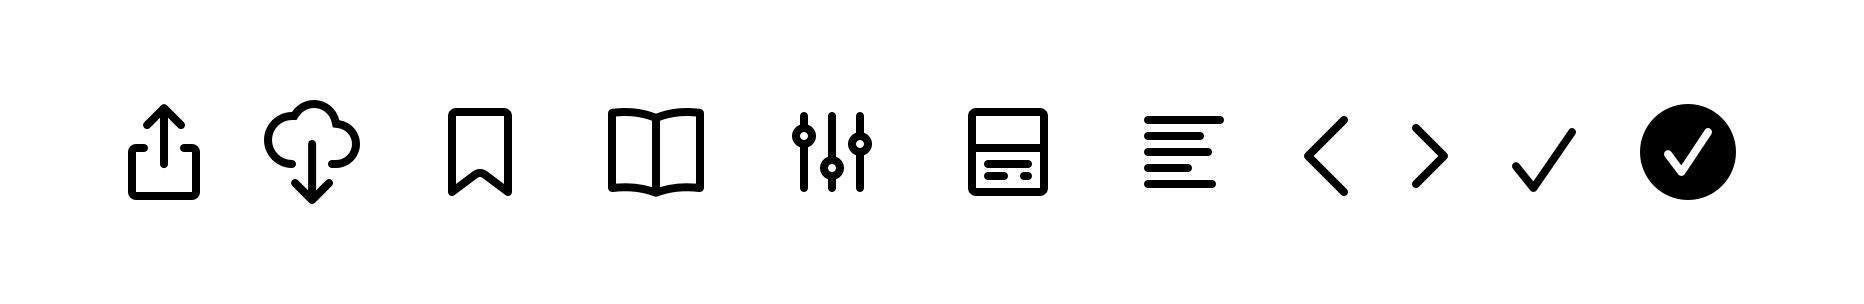 atl-app-icons